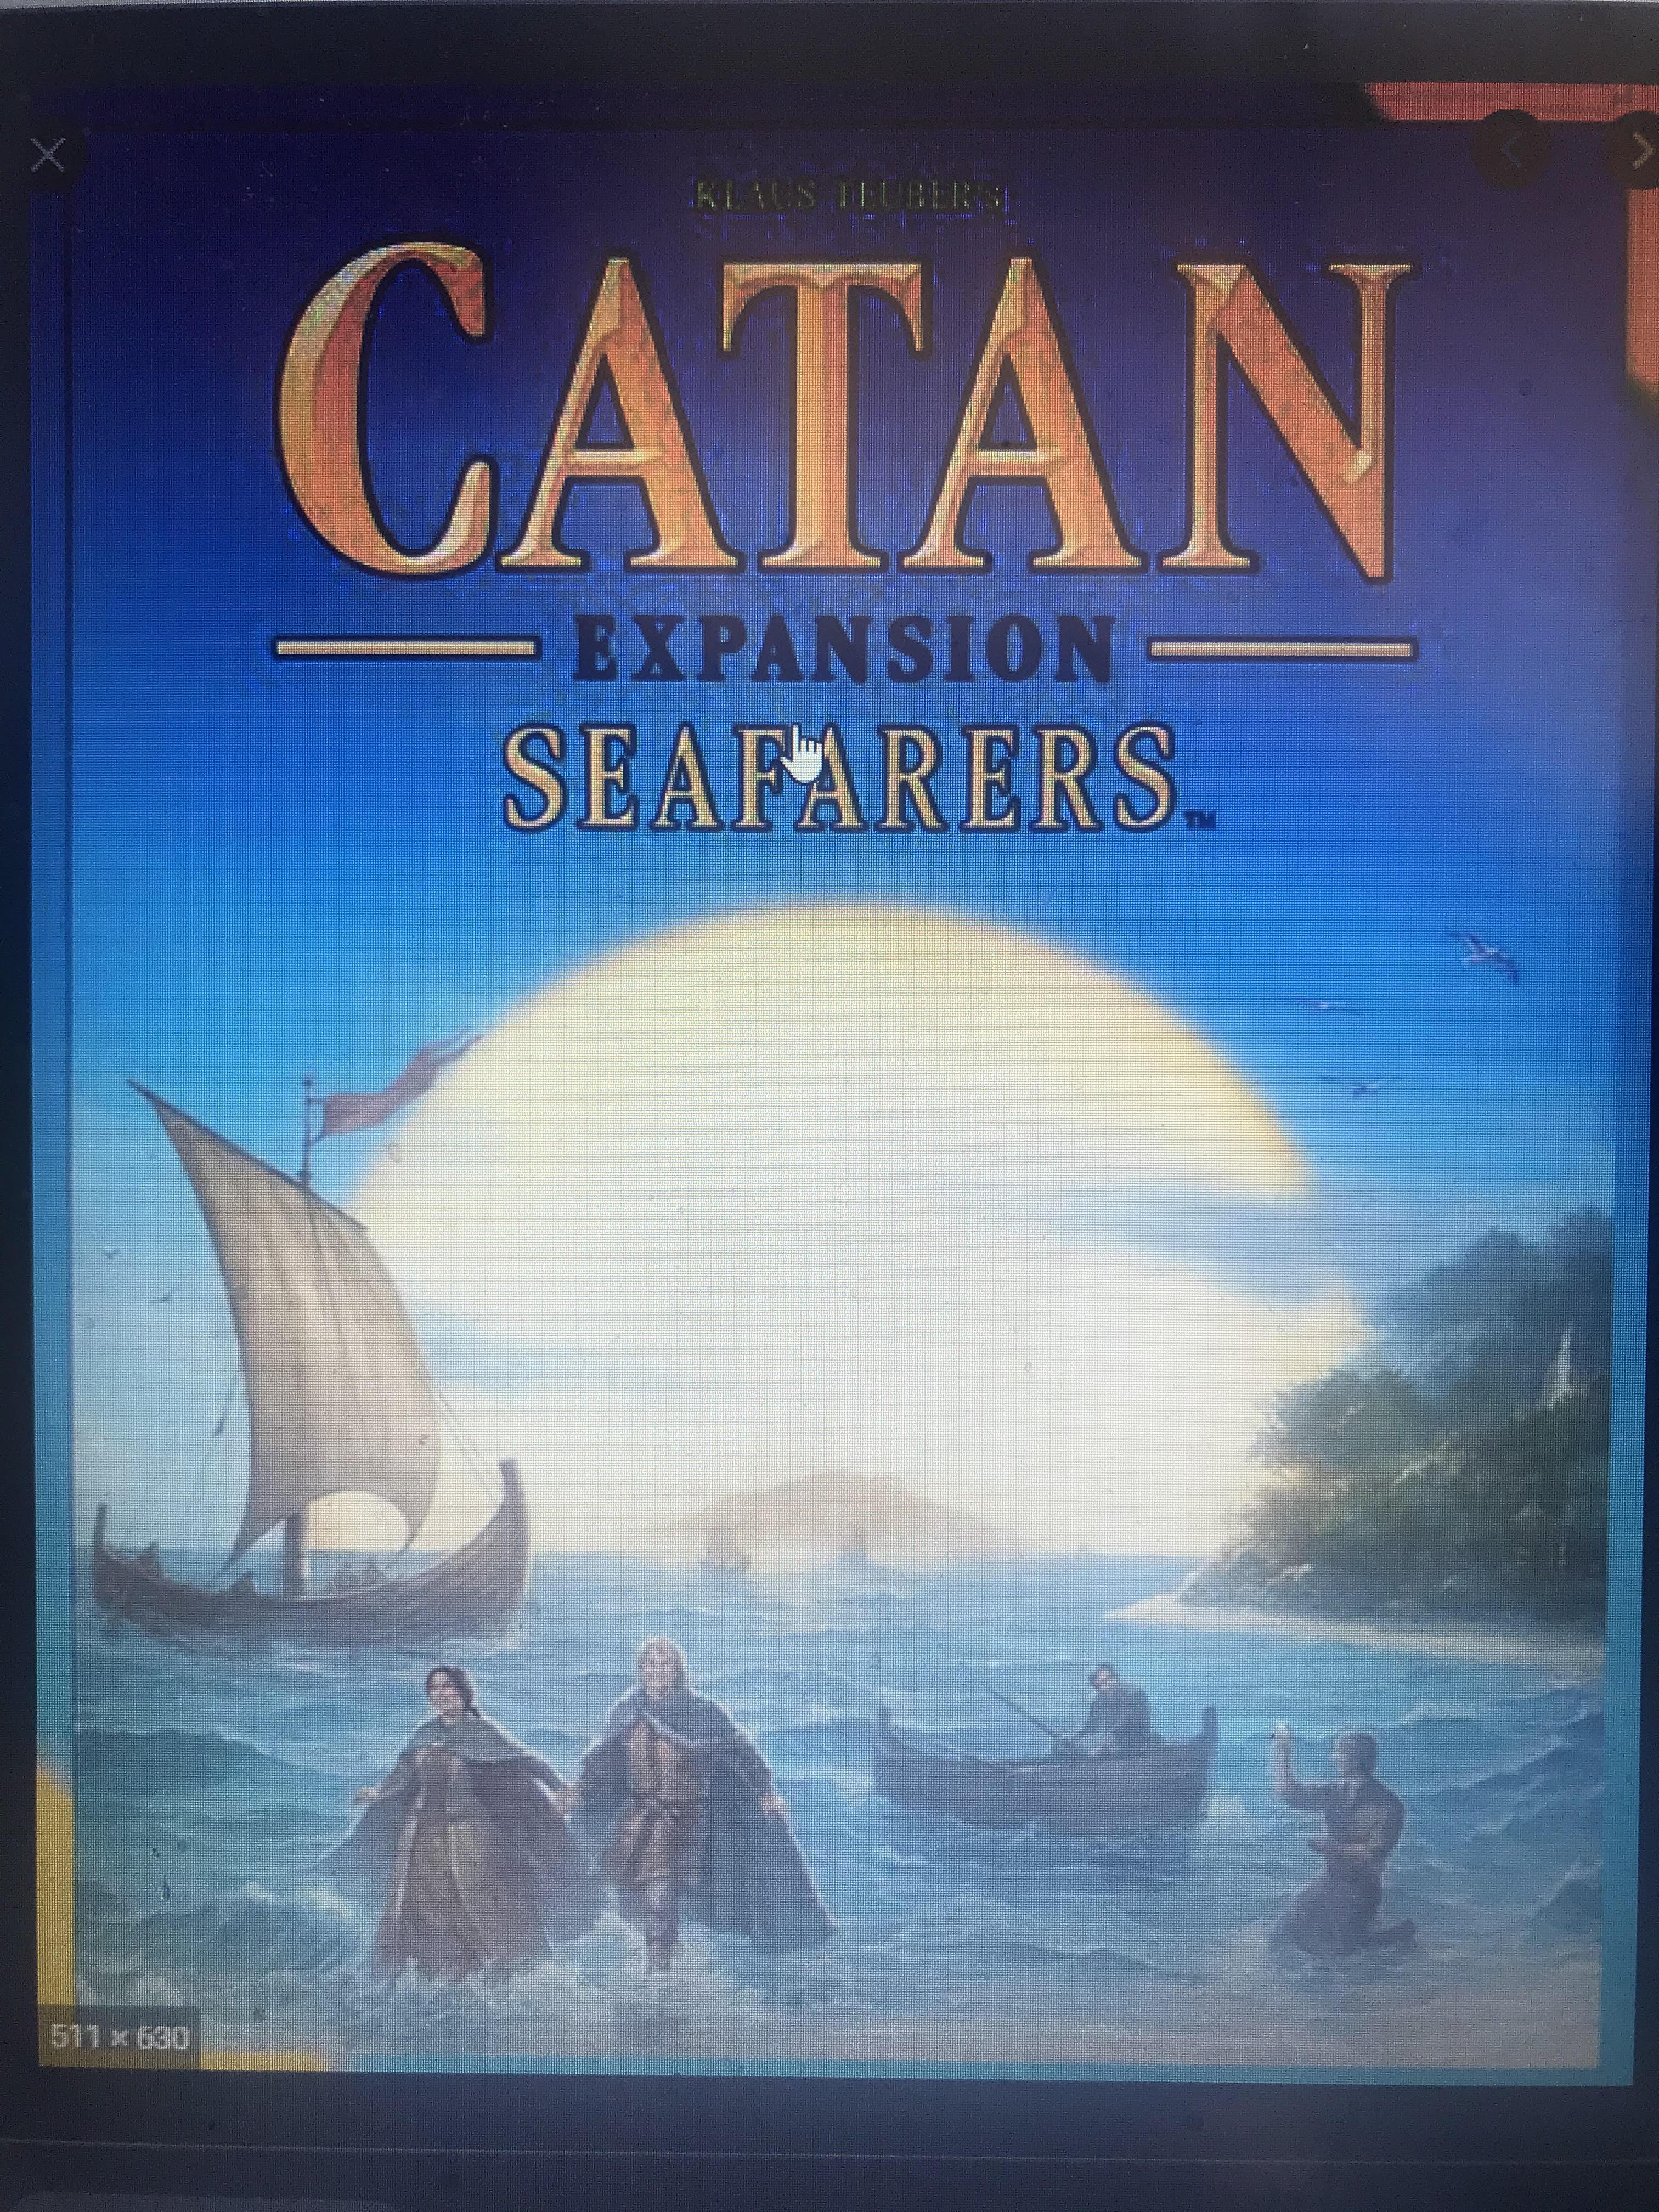 Catan Expansion Seafarers